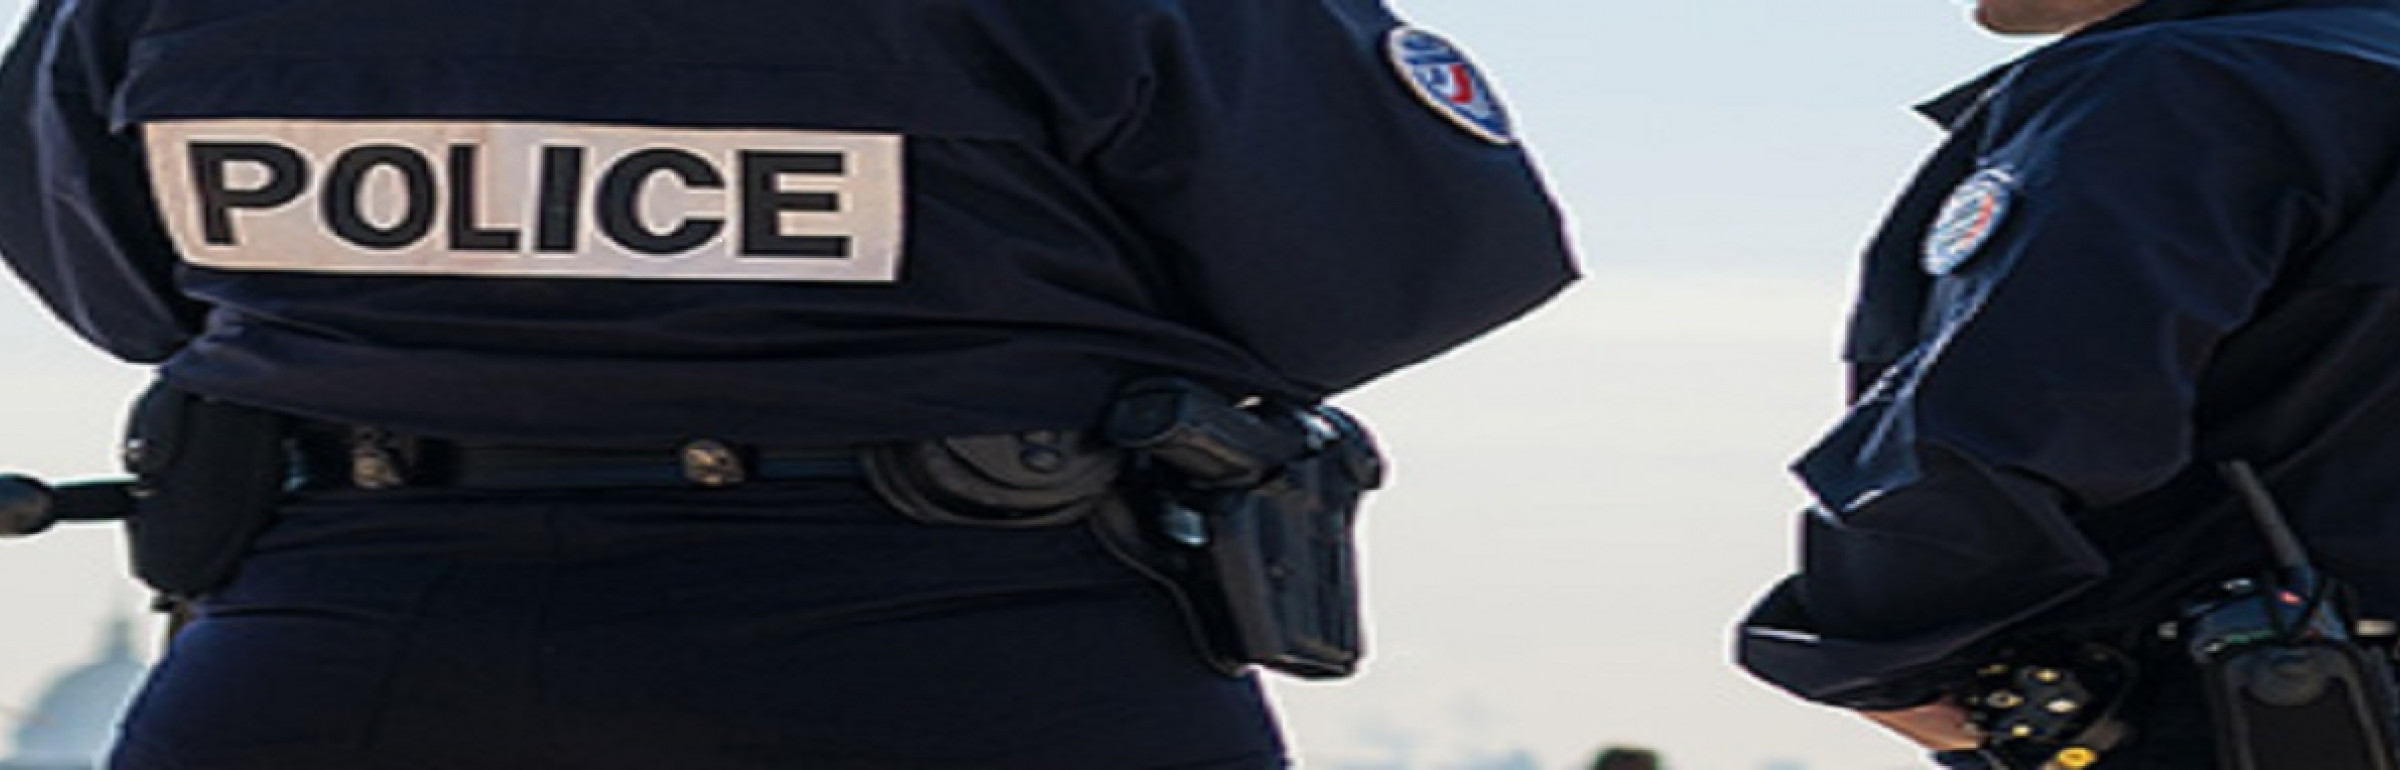 Banner POLICE NATIONALE